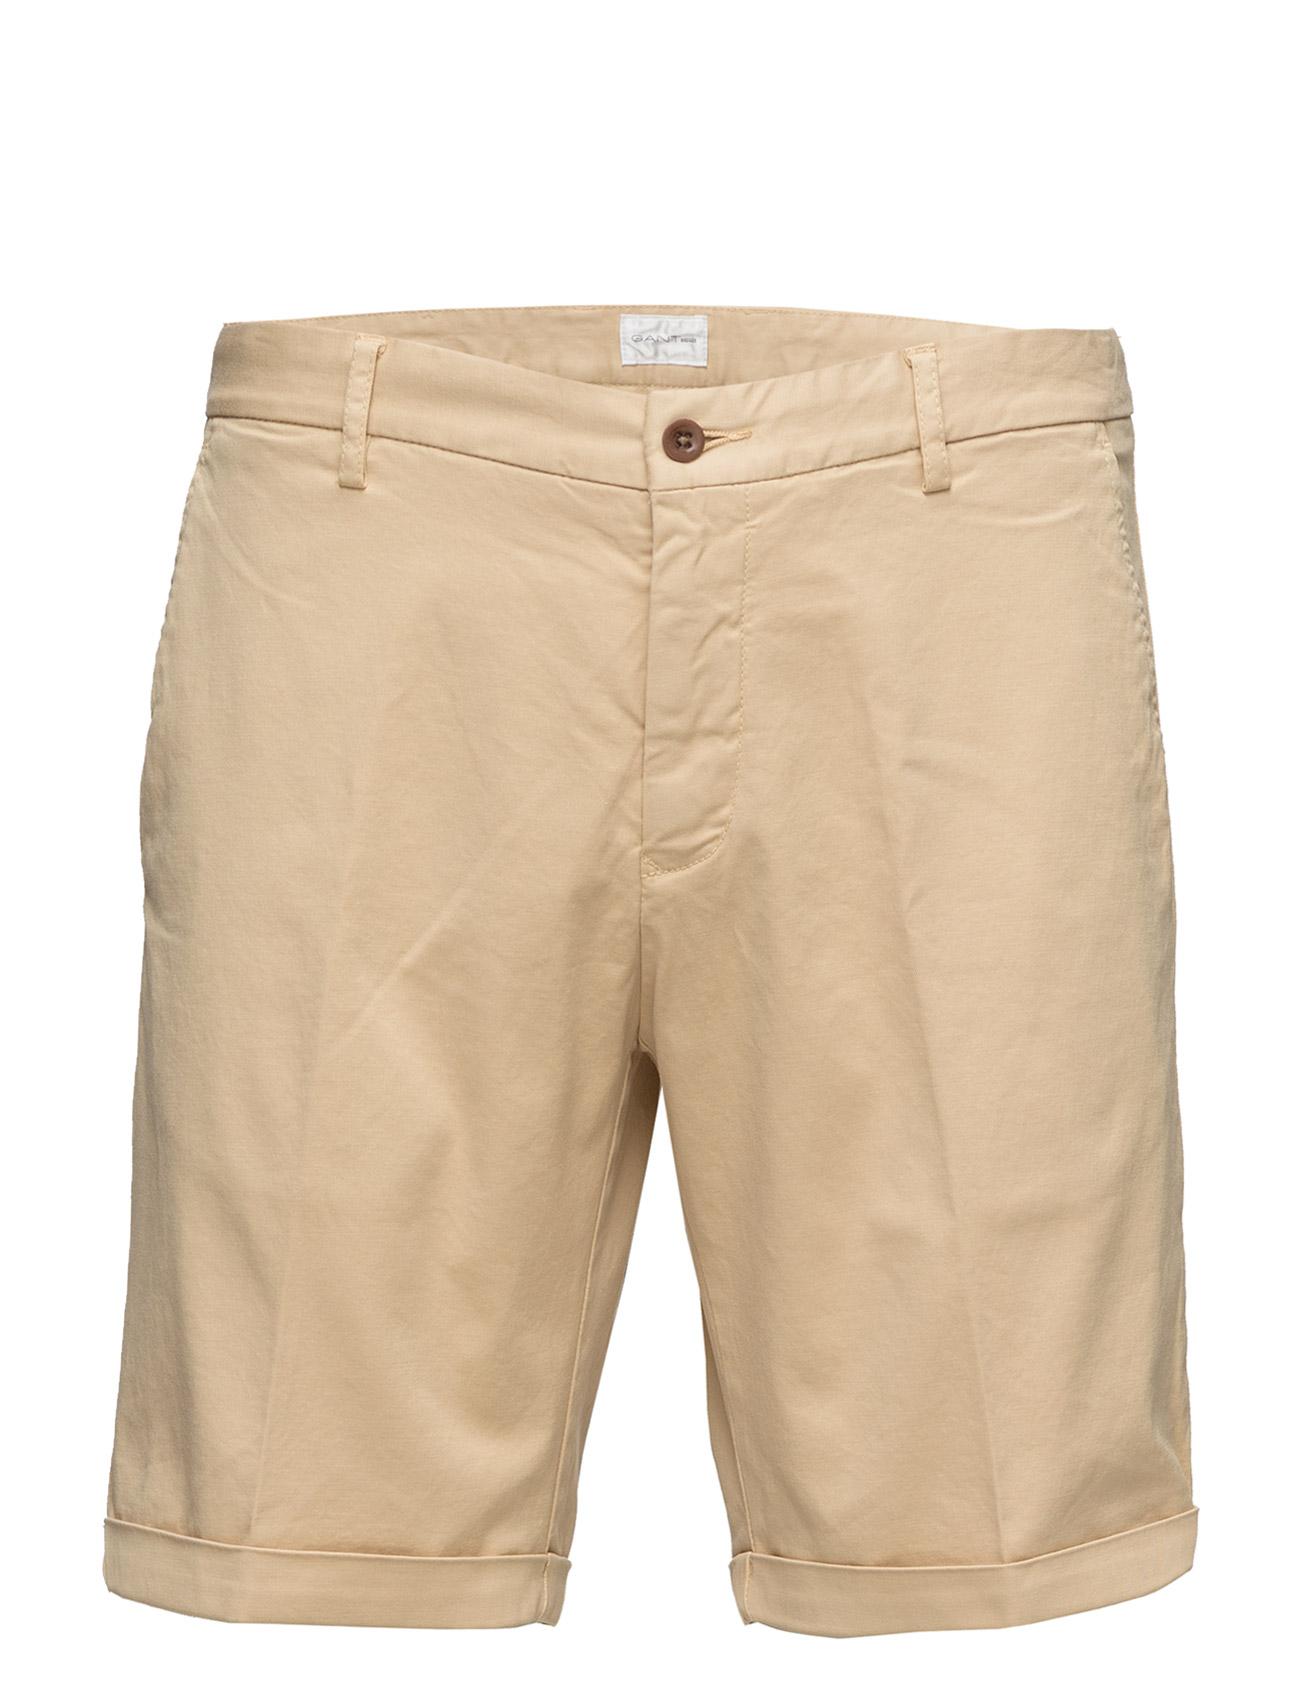 R2. Rugger Chino Shorts GANT Rugger Bermuda Shorts